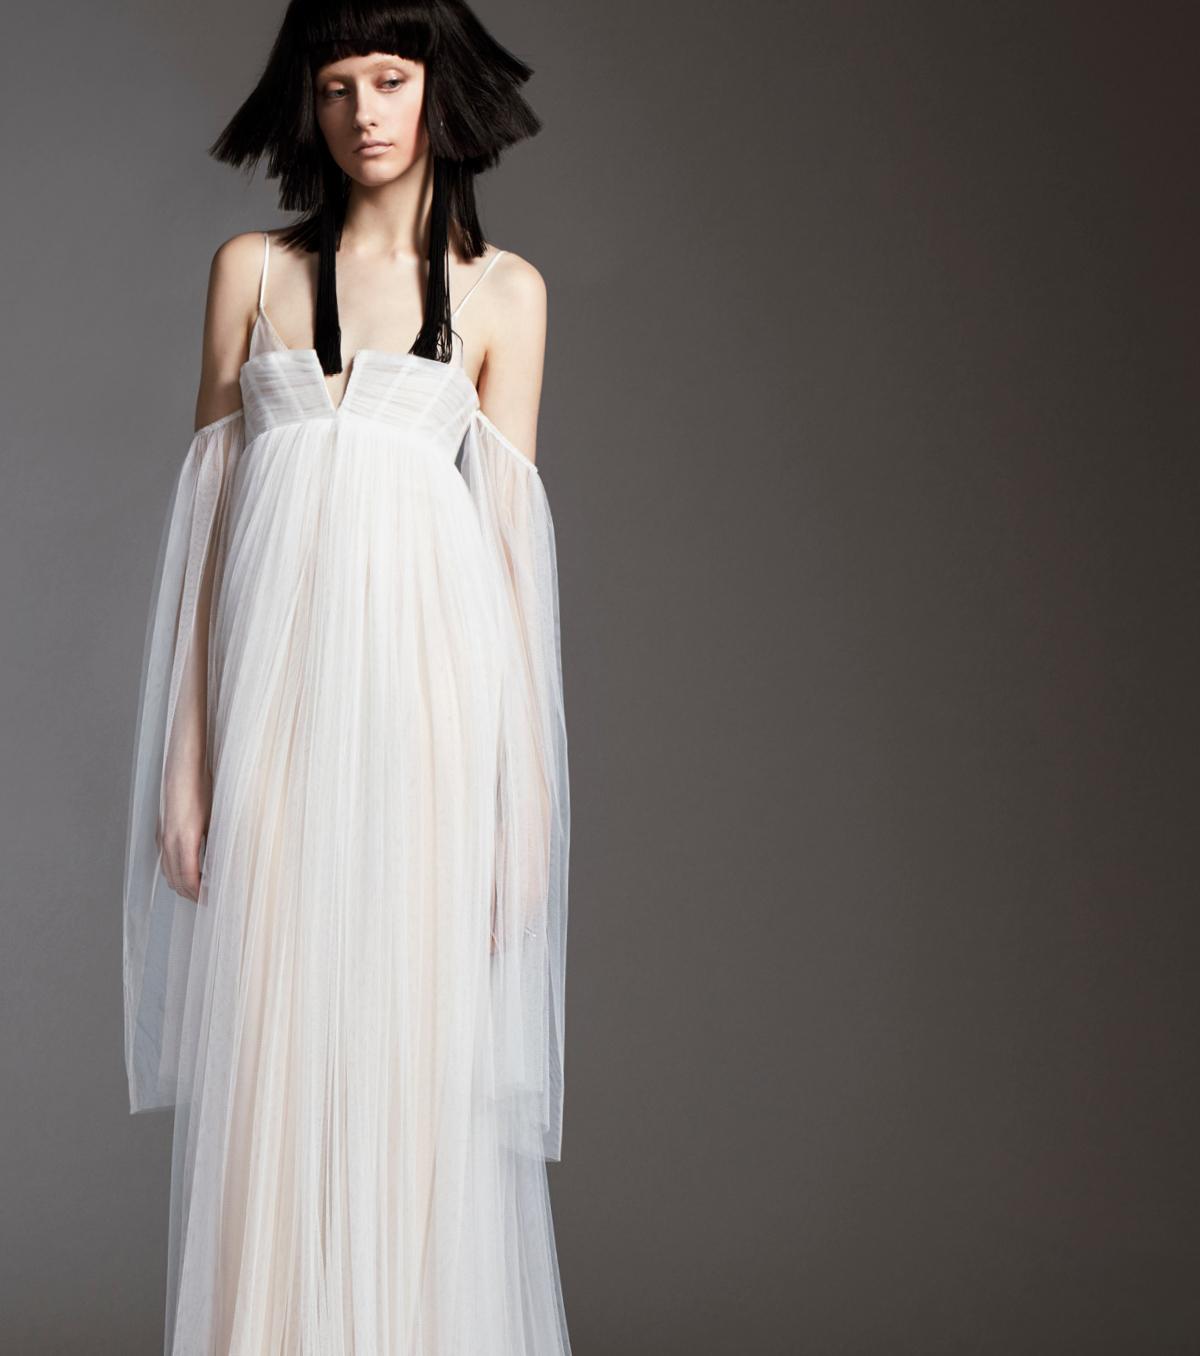 Brautkleider von Vera Wang: Frühlingskollektion 2018